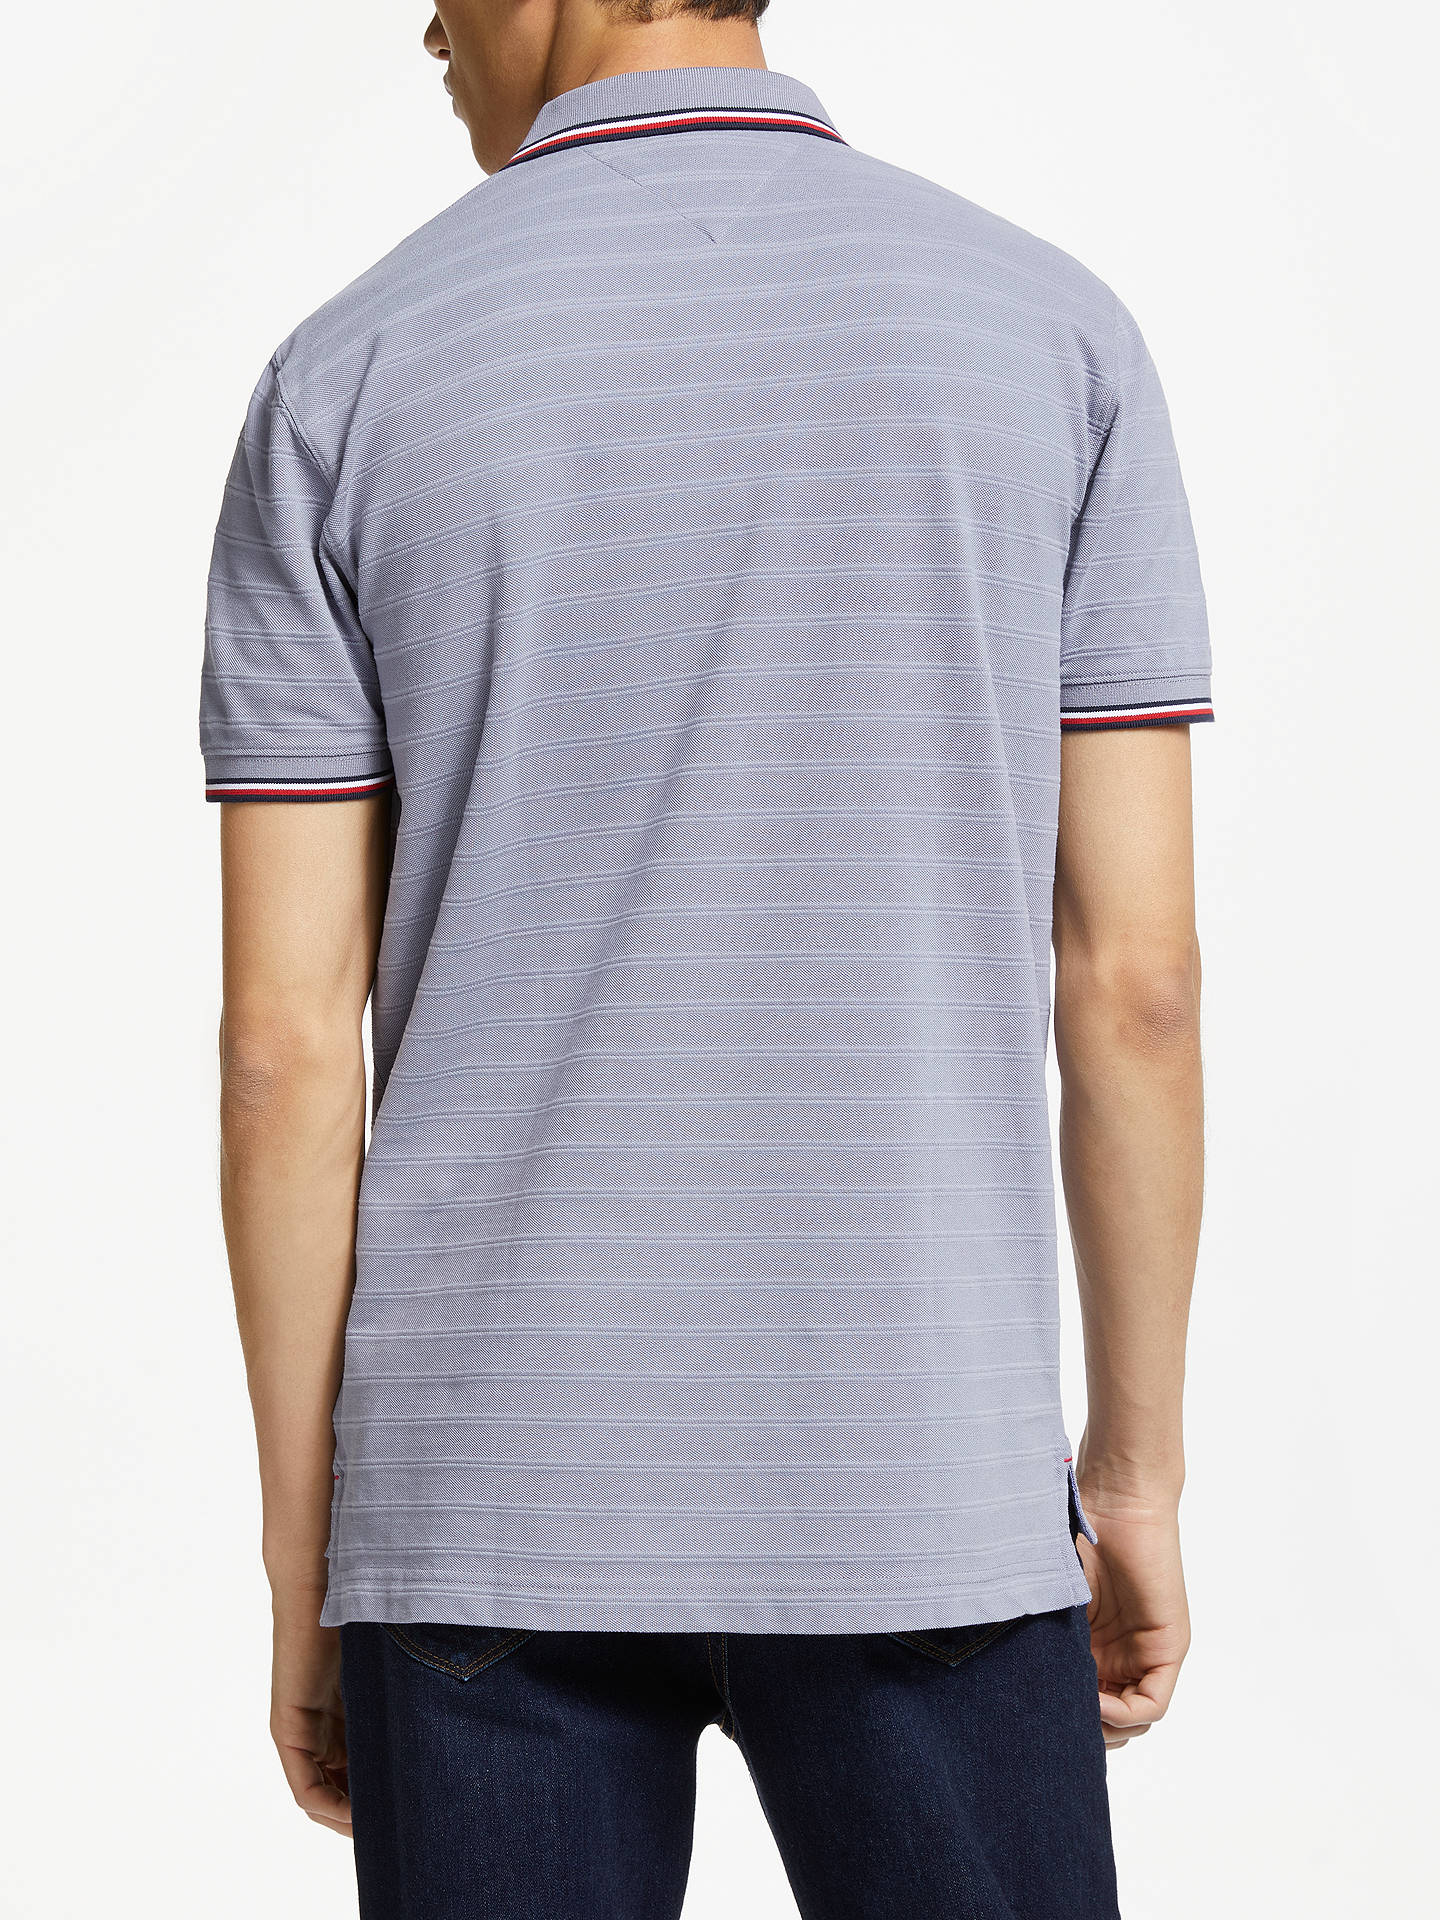 dd364d6c7b08ff ... Buy Tommy Hilfiger Tonal Texture Polo Shirt